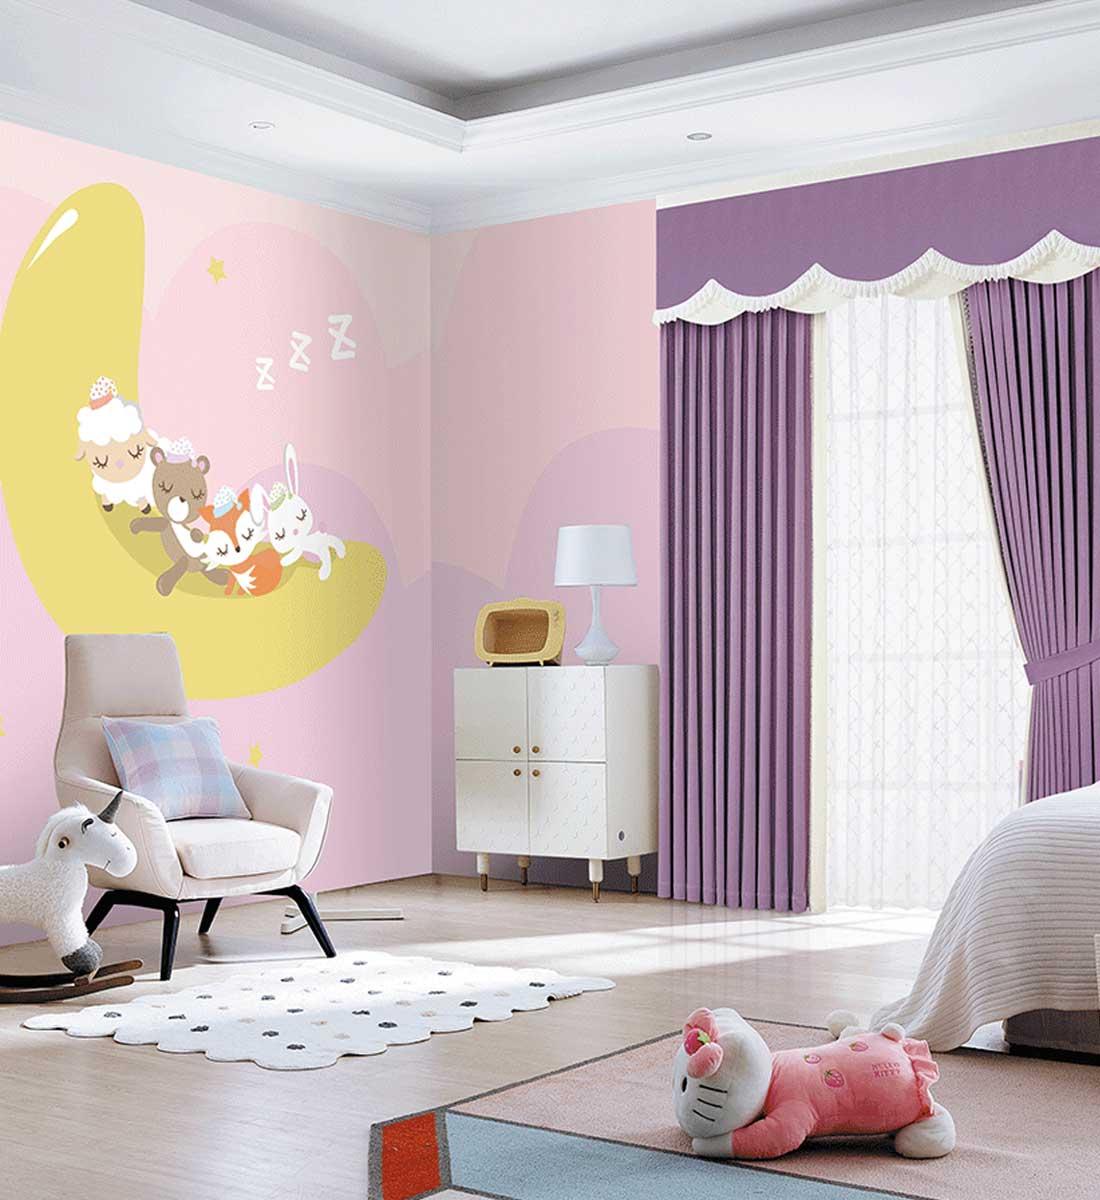 JCC天洋女孩房定制墙布窗帘软装搭配